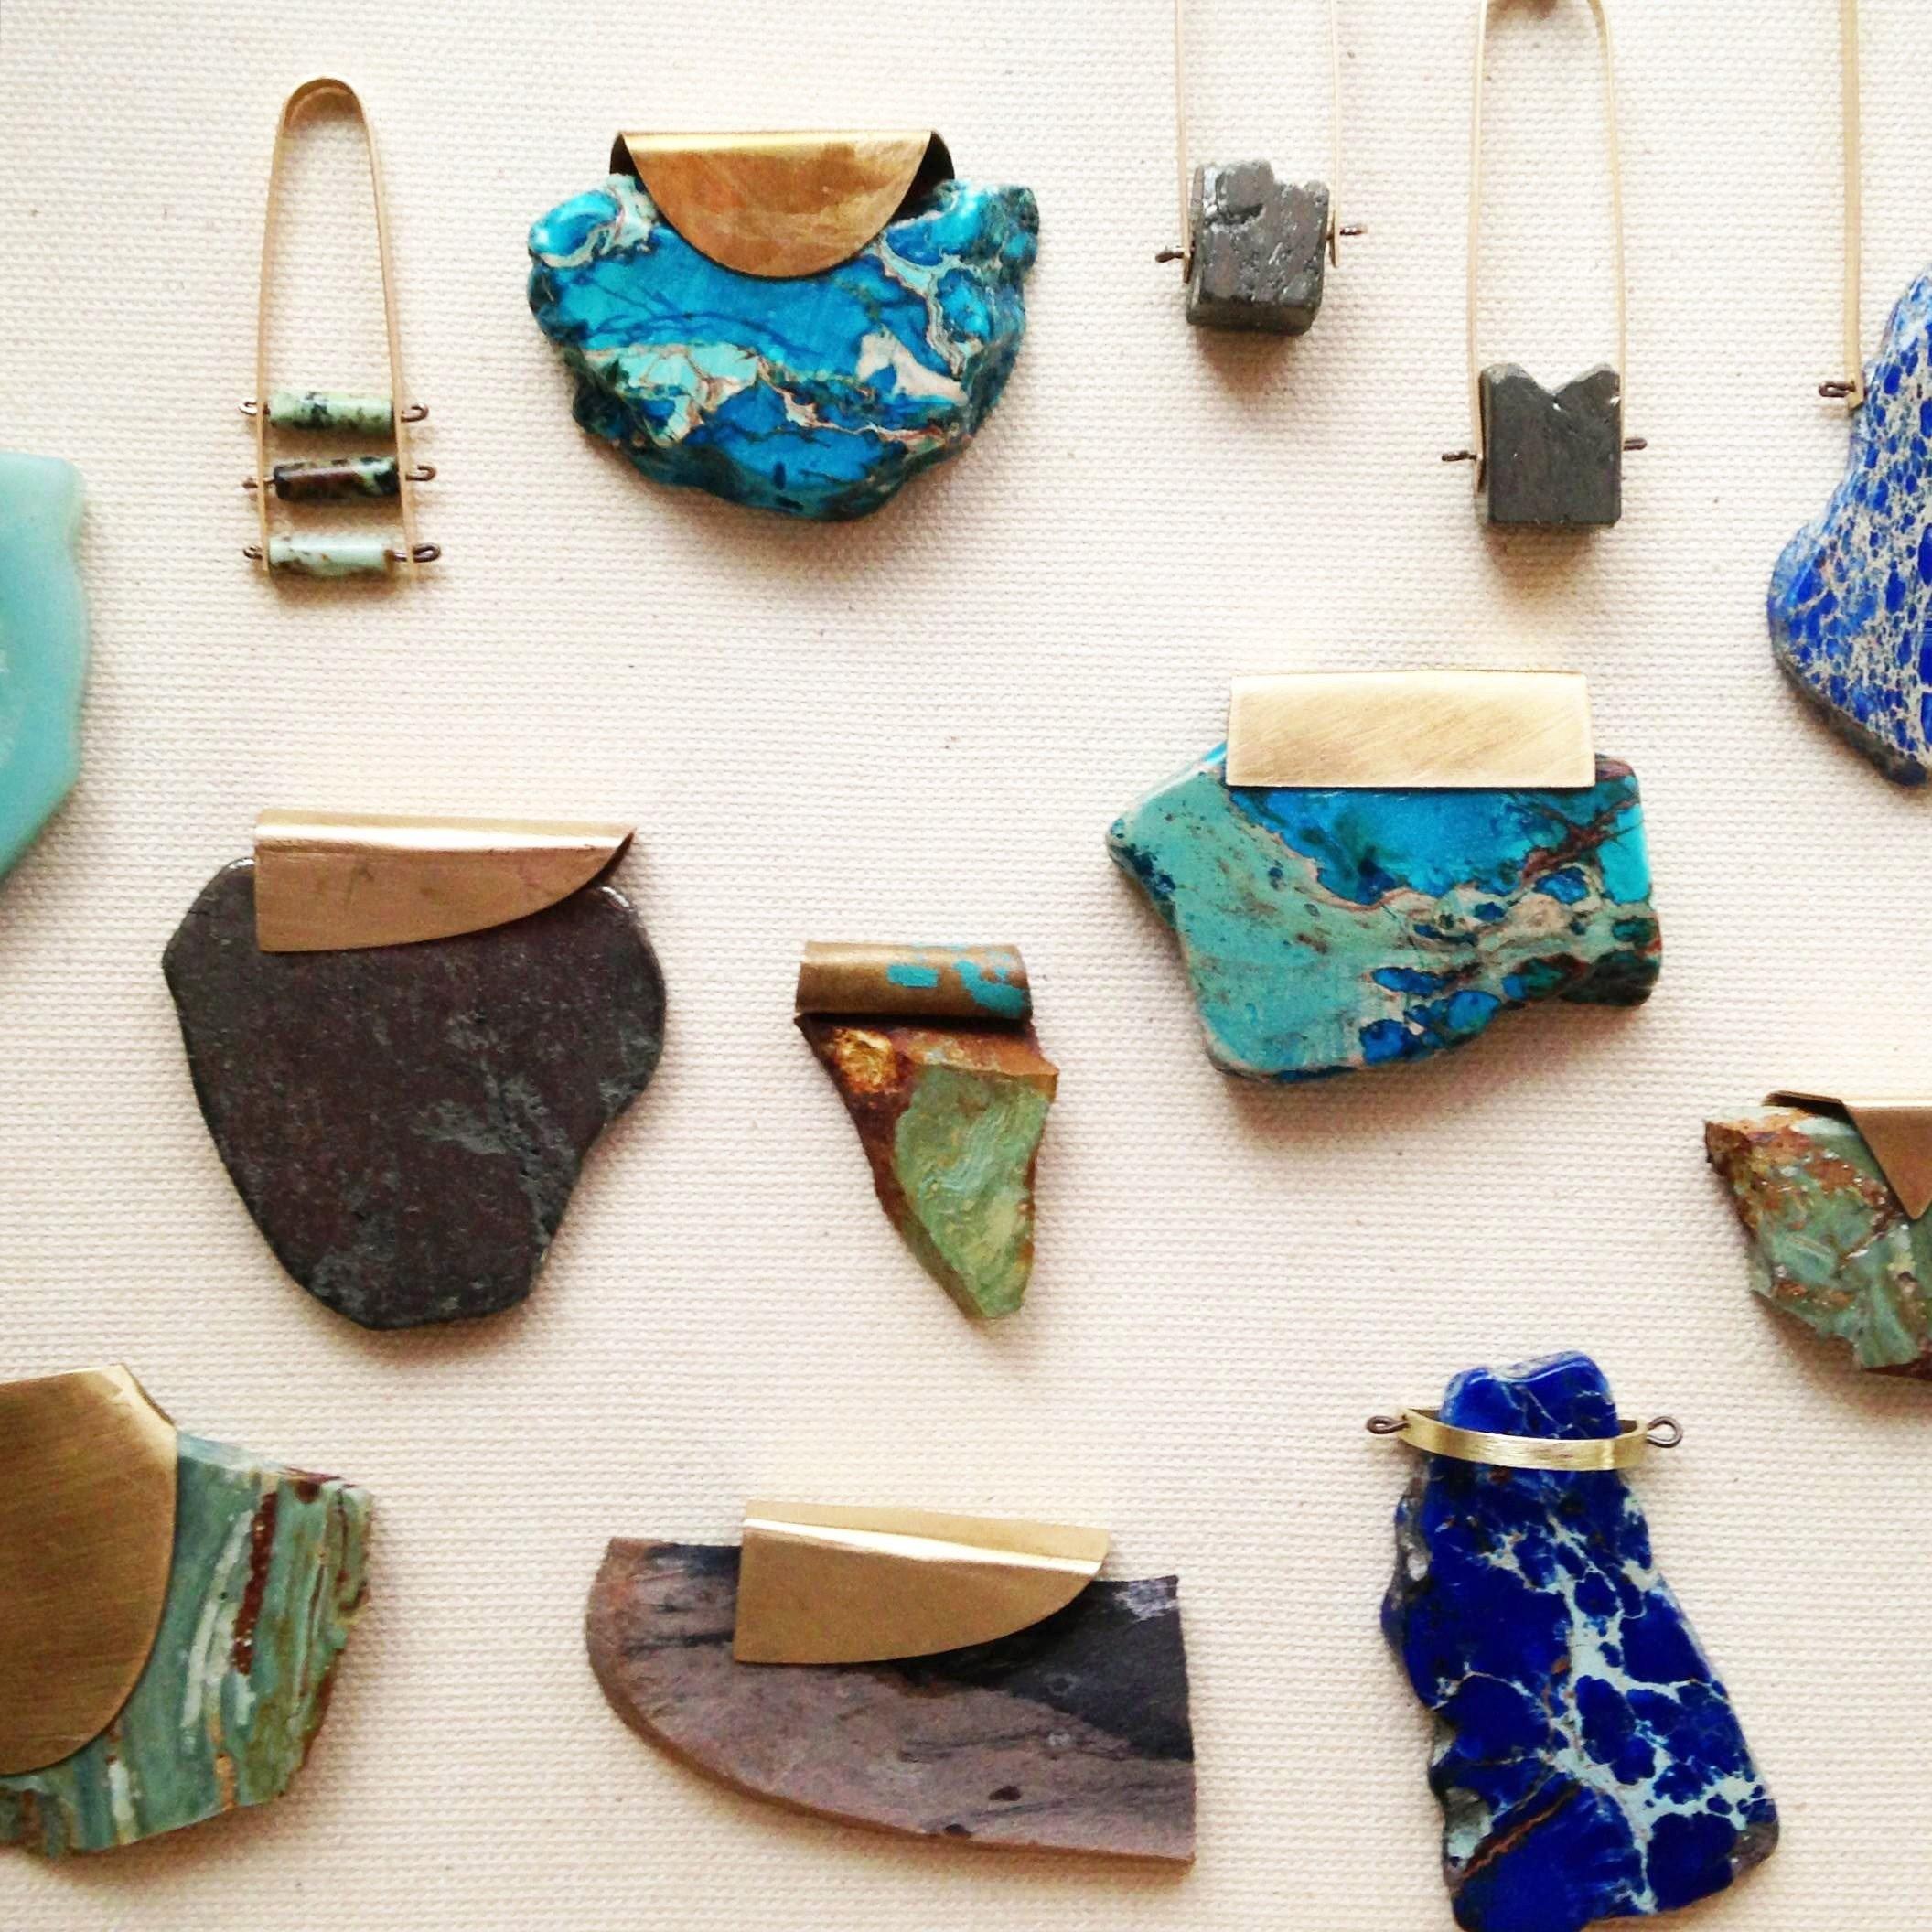 Trip Ideas jewellery earrings fashion accessory art turquoise colored arranged